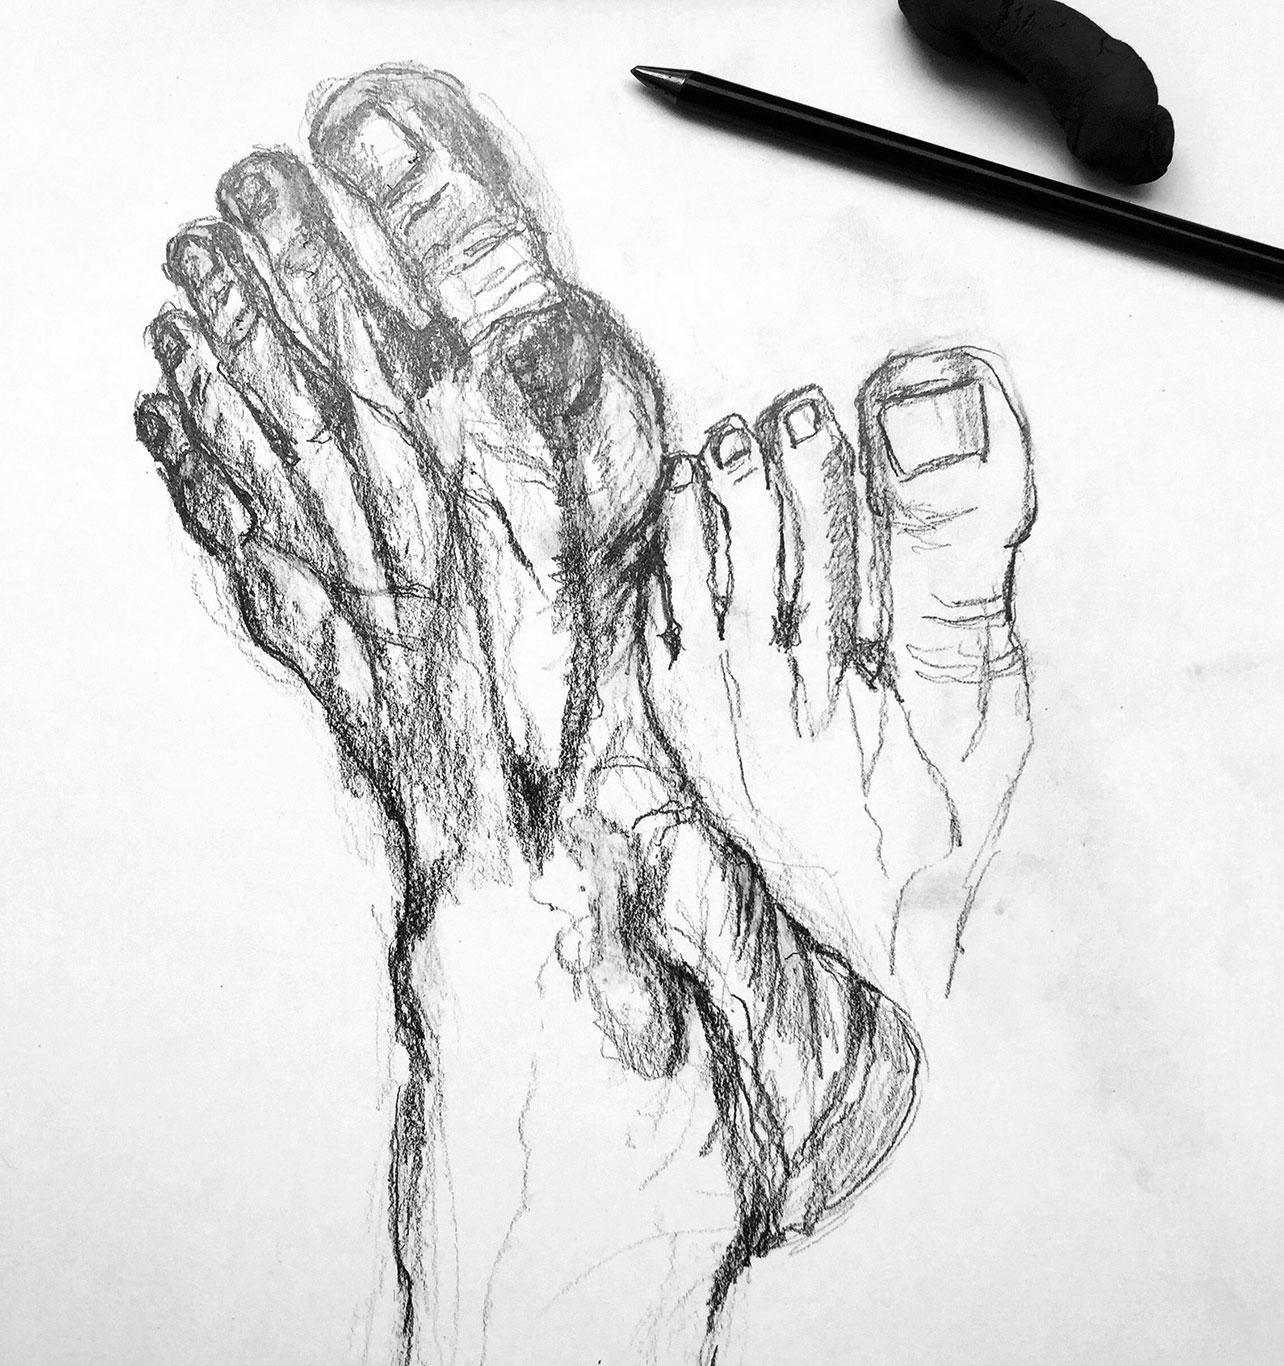 Gesture Drawing, Graphite, Dagmar Kuchler. Germany